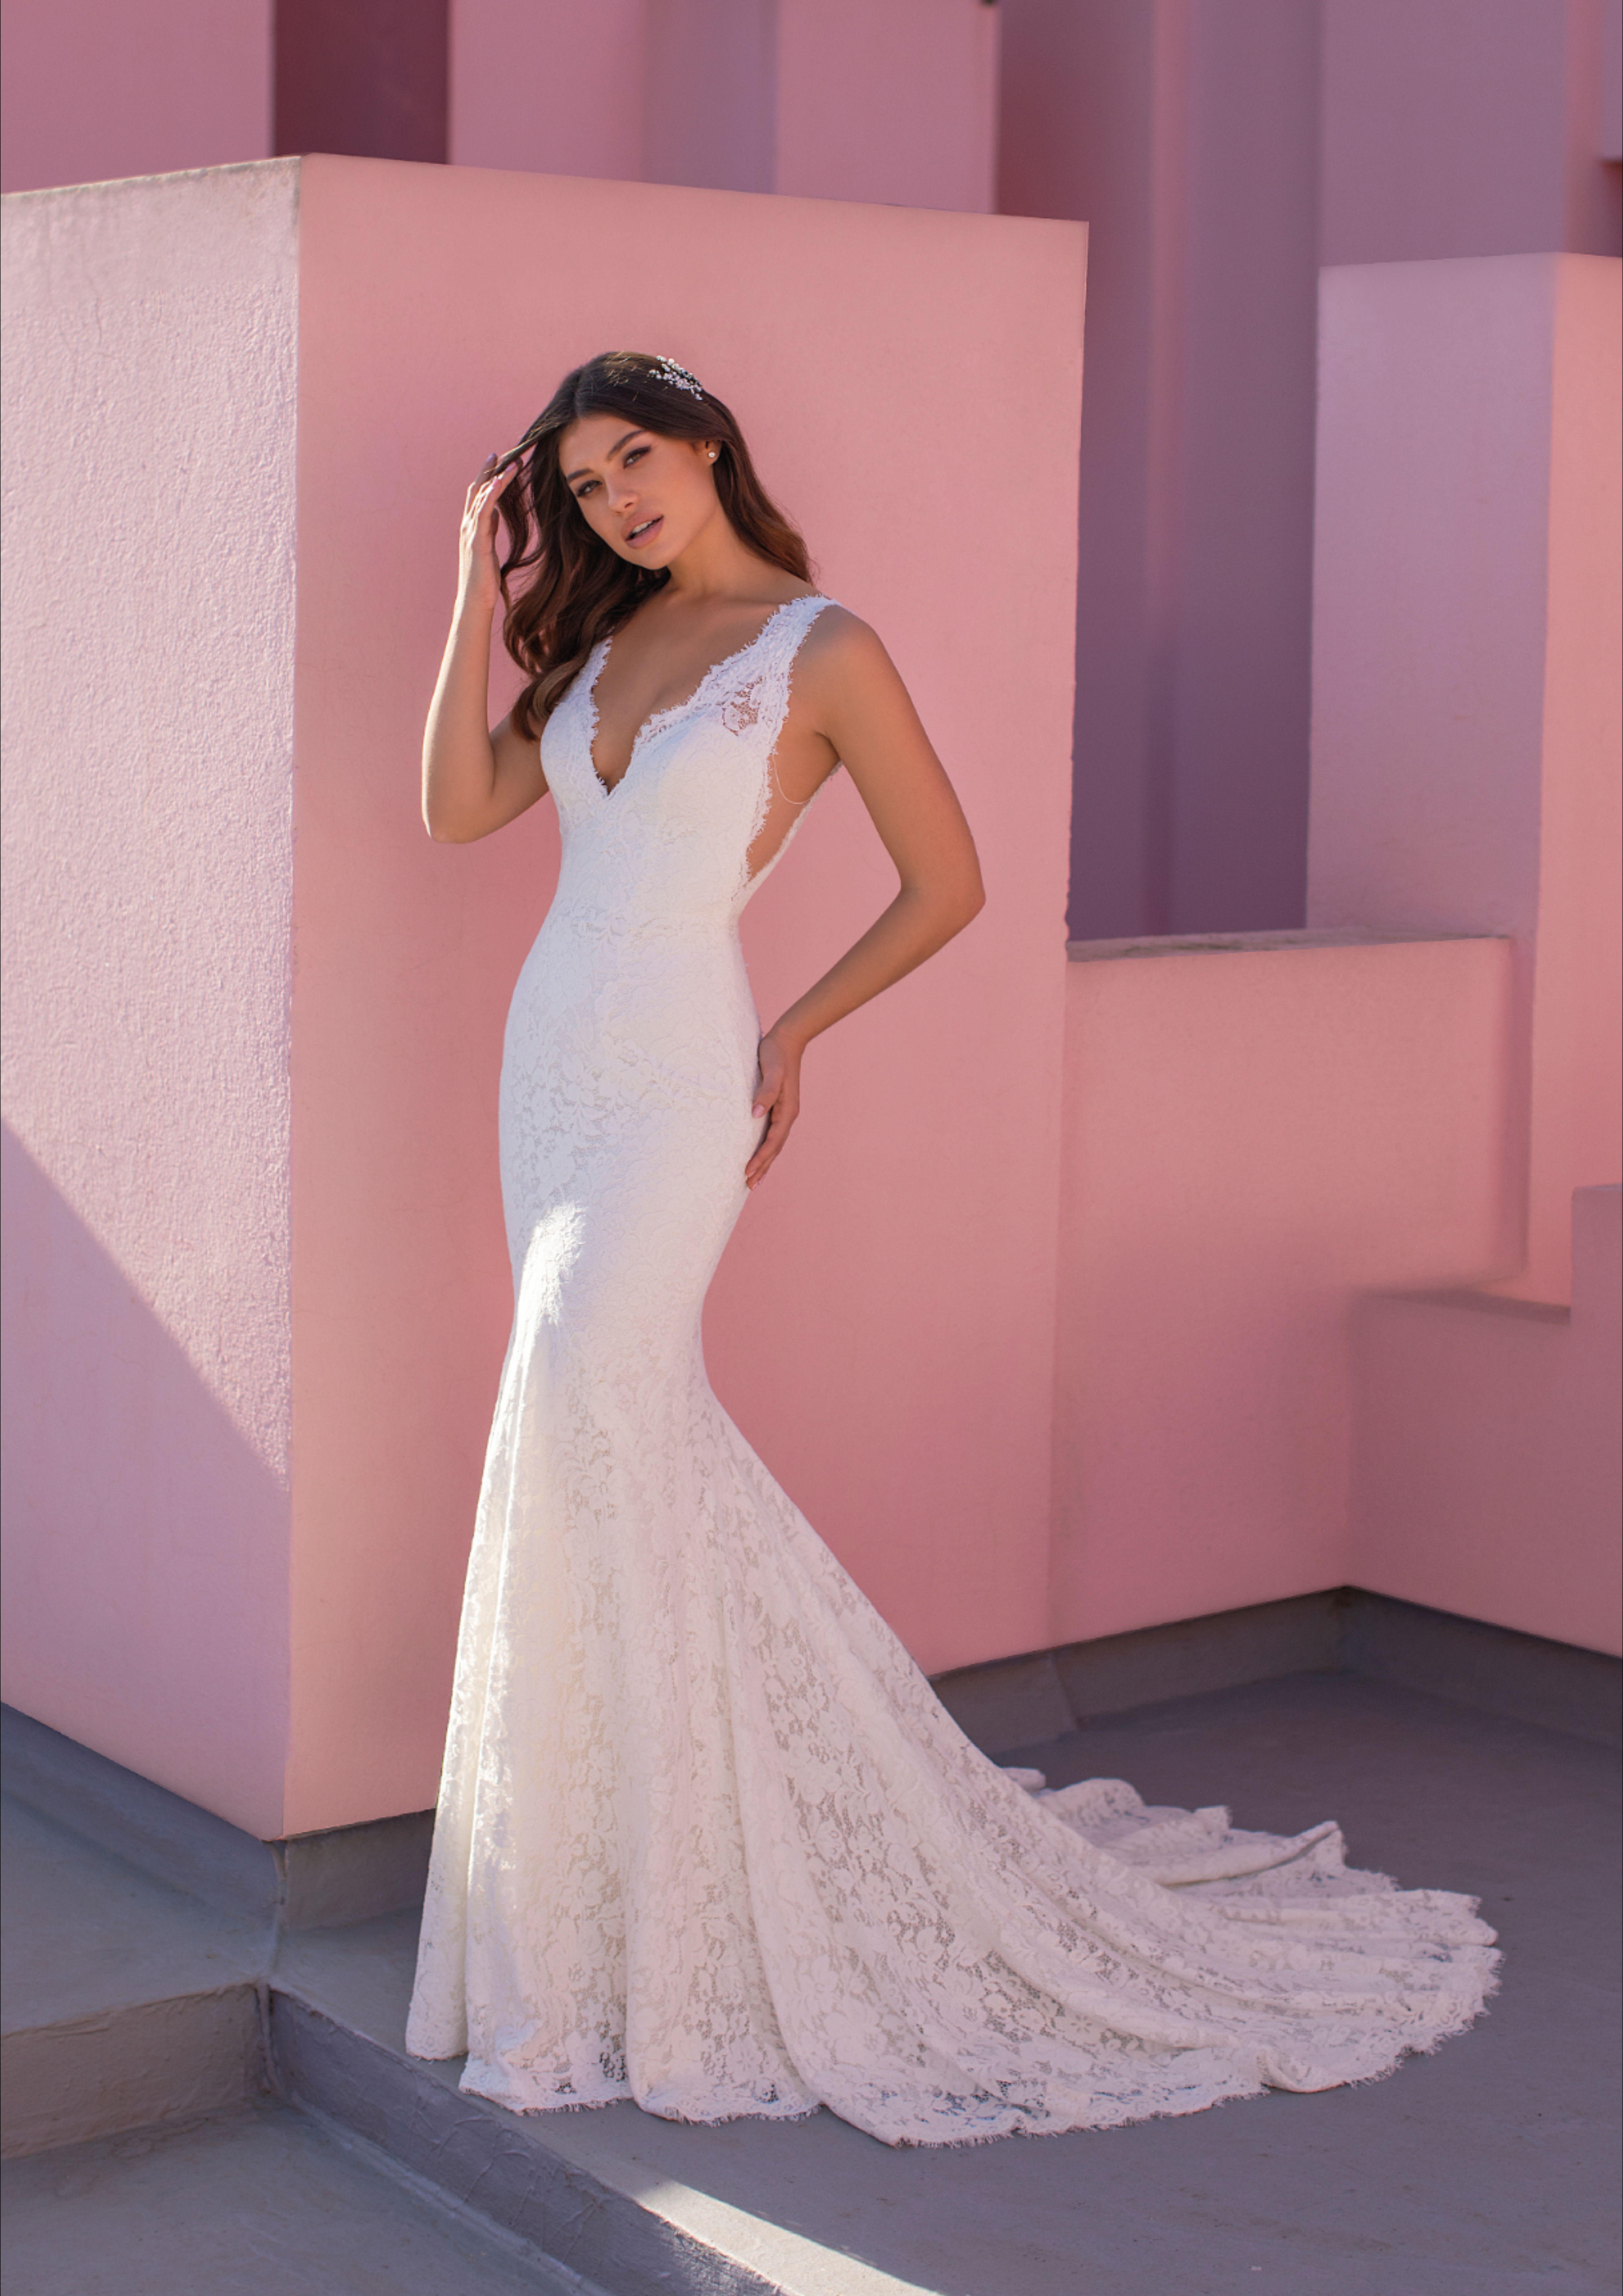 Spitzenkleid Meerjungfrau Brautkleid Mit Cutouts Brautkleid Hochzeitskleid Spitze Braut